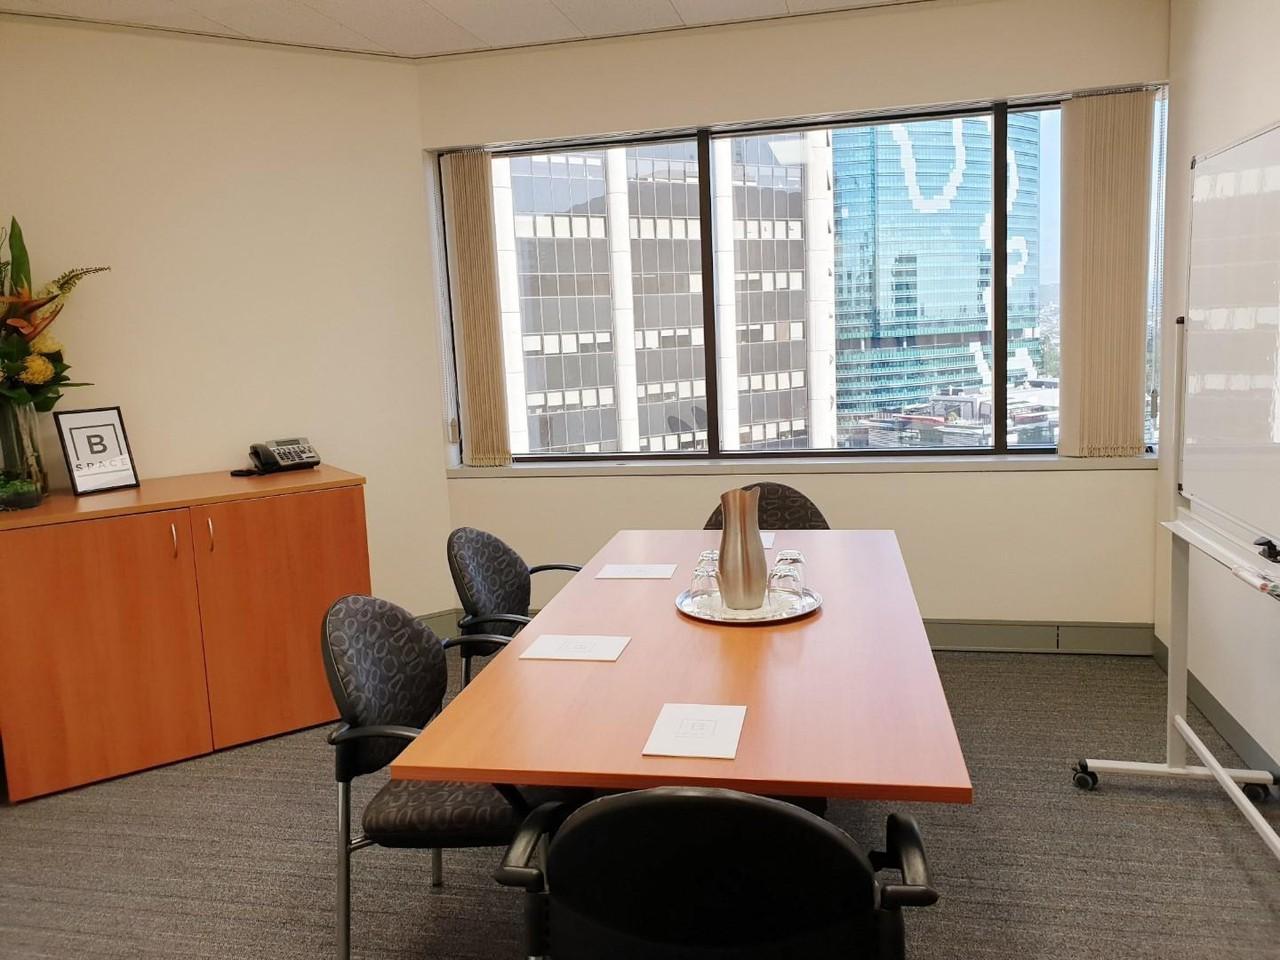 Brisbane conference rooms Meeting room BSPACE Brisbane - Meeting Room image 0